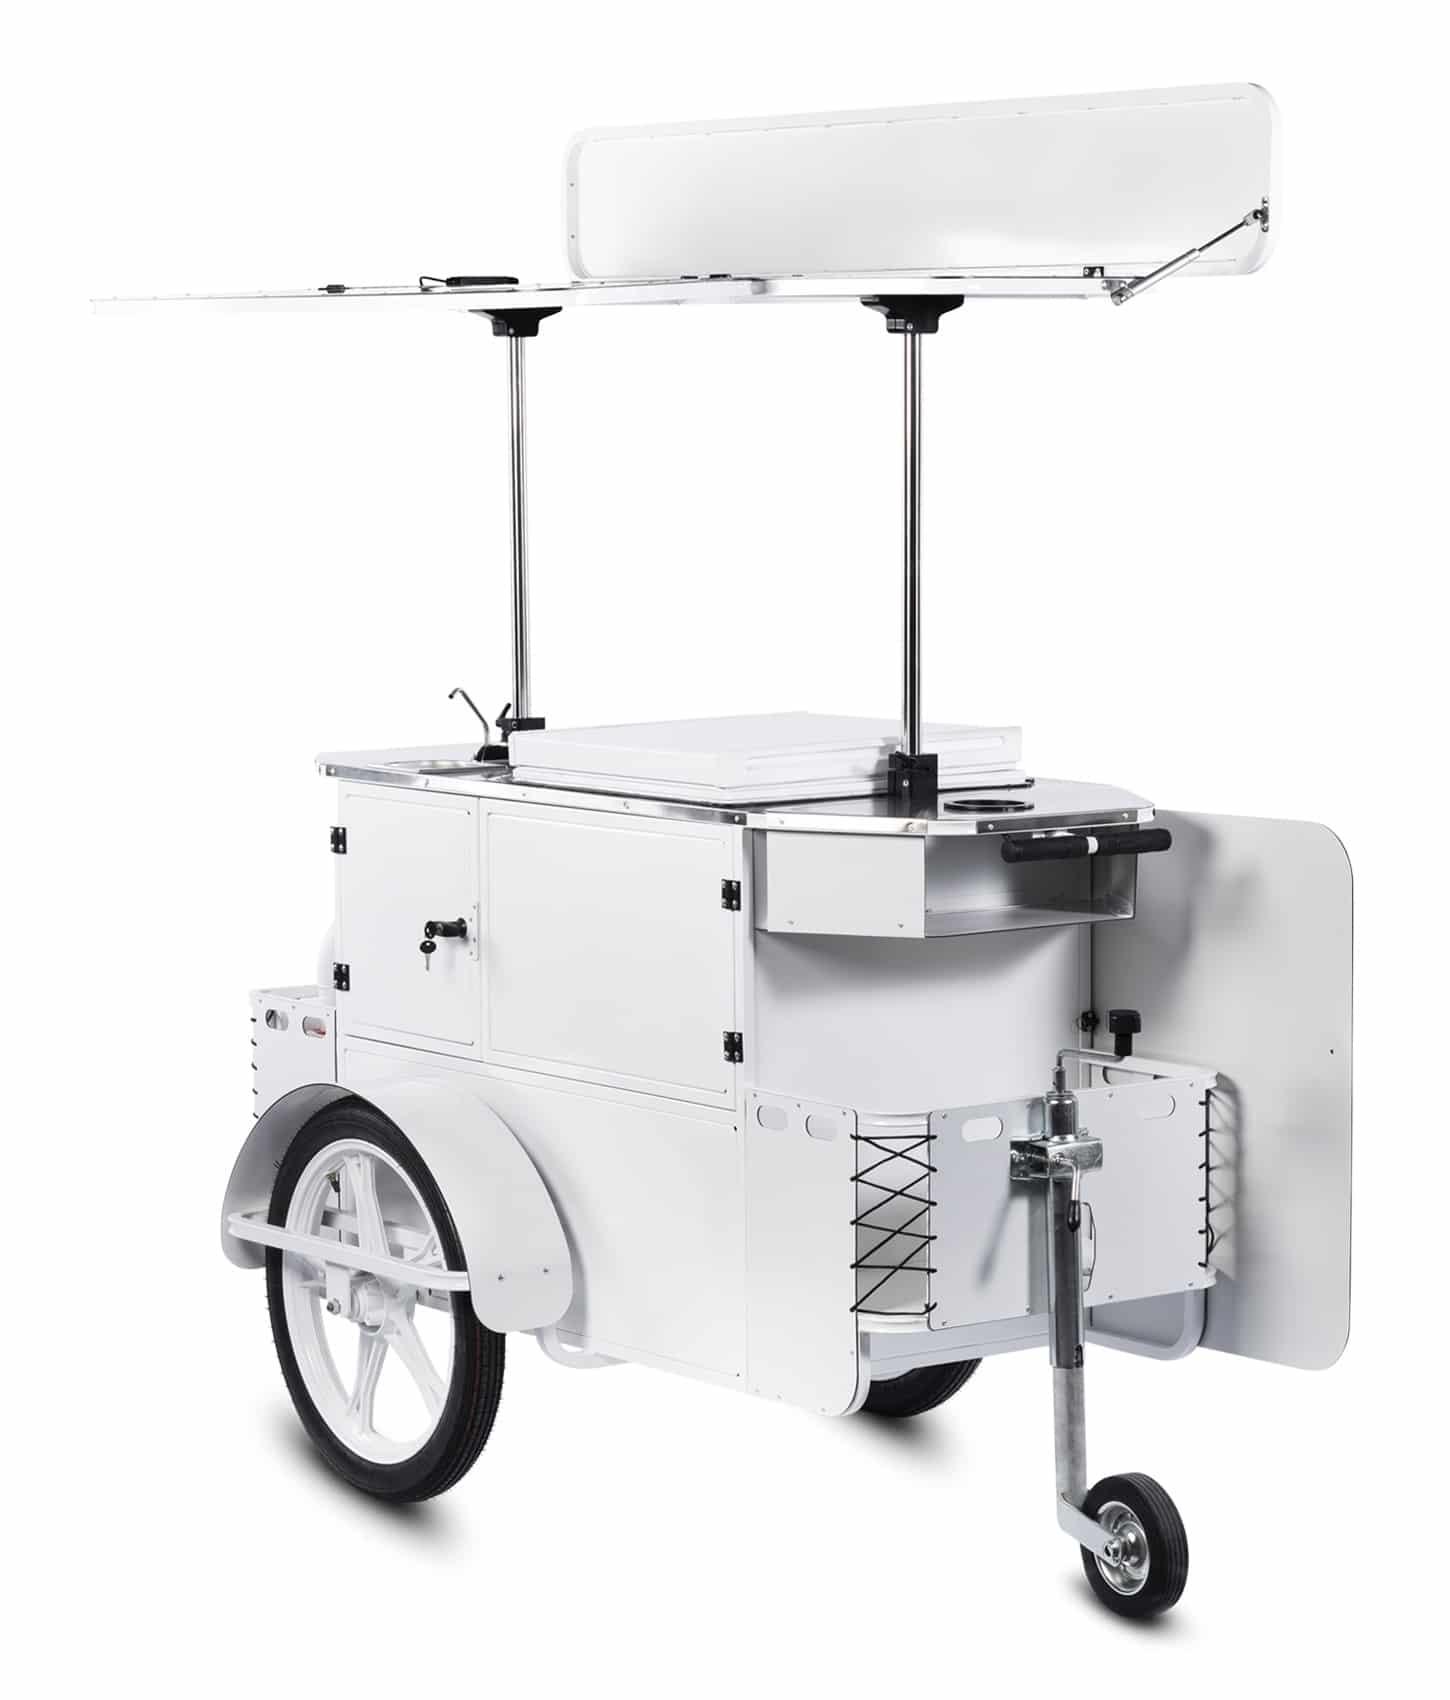 Bizz On Wheels ice cream cart perspective view